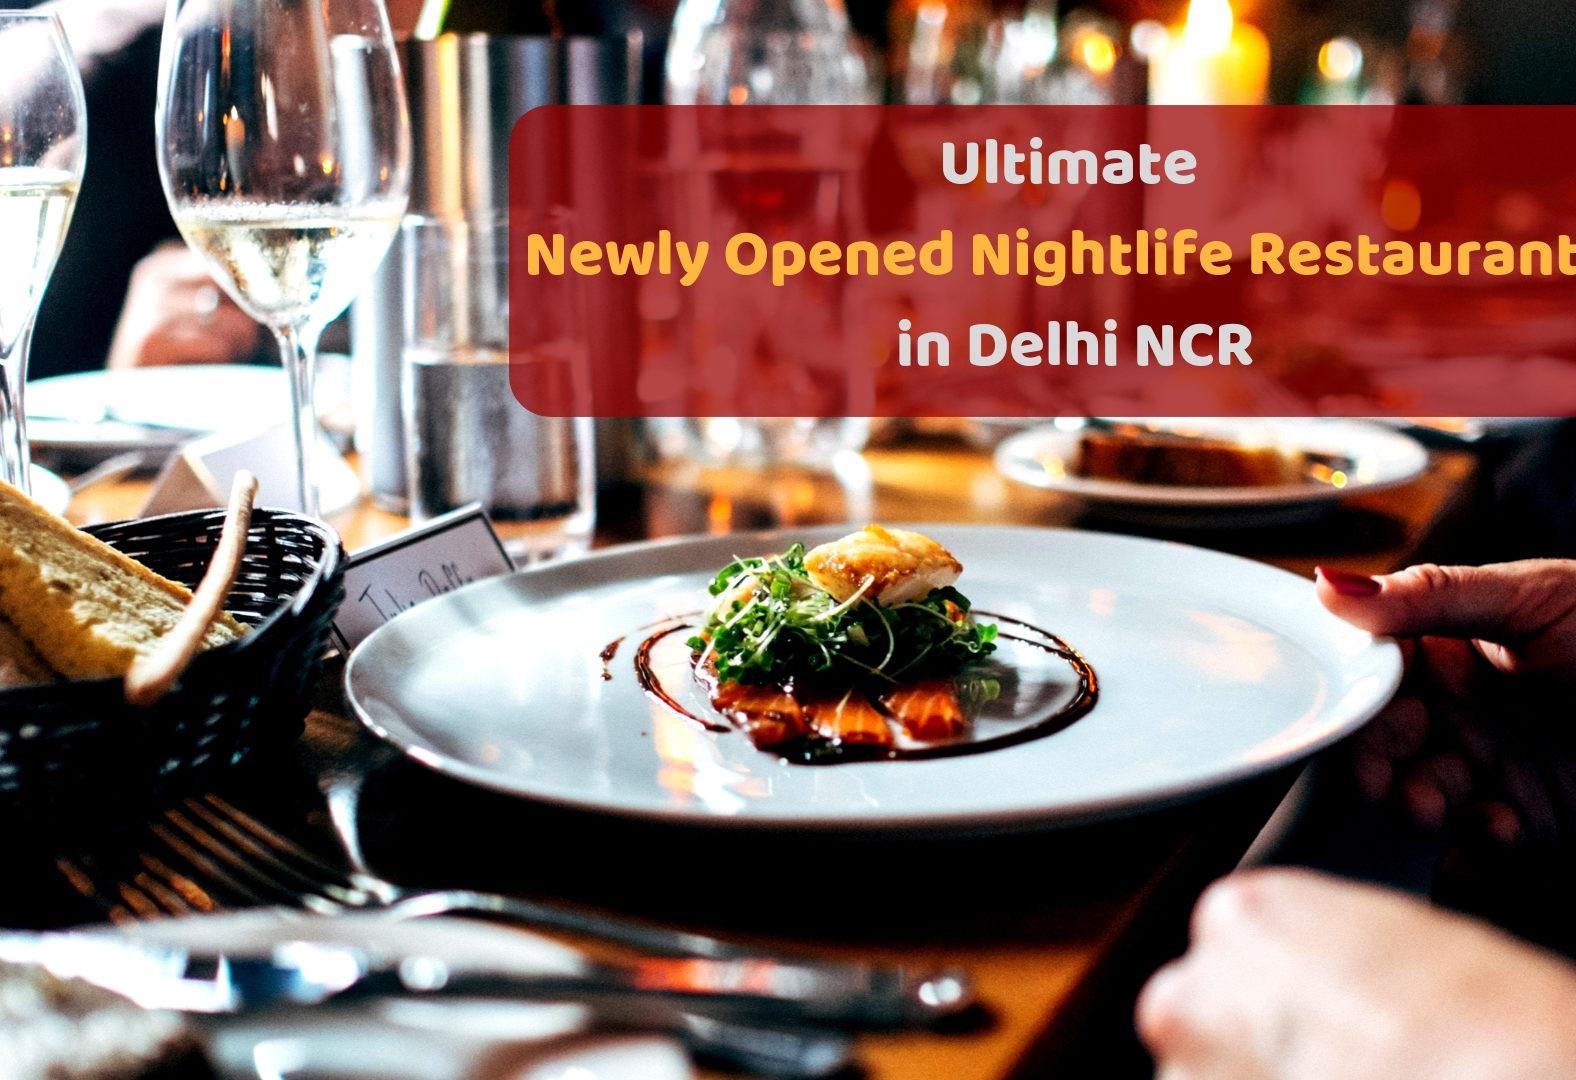 Ultimate Newly opened nightlife restaurants in Delhi NCR